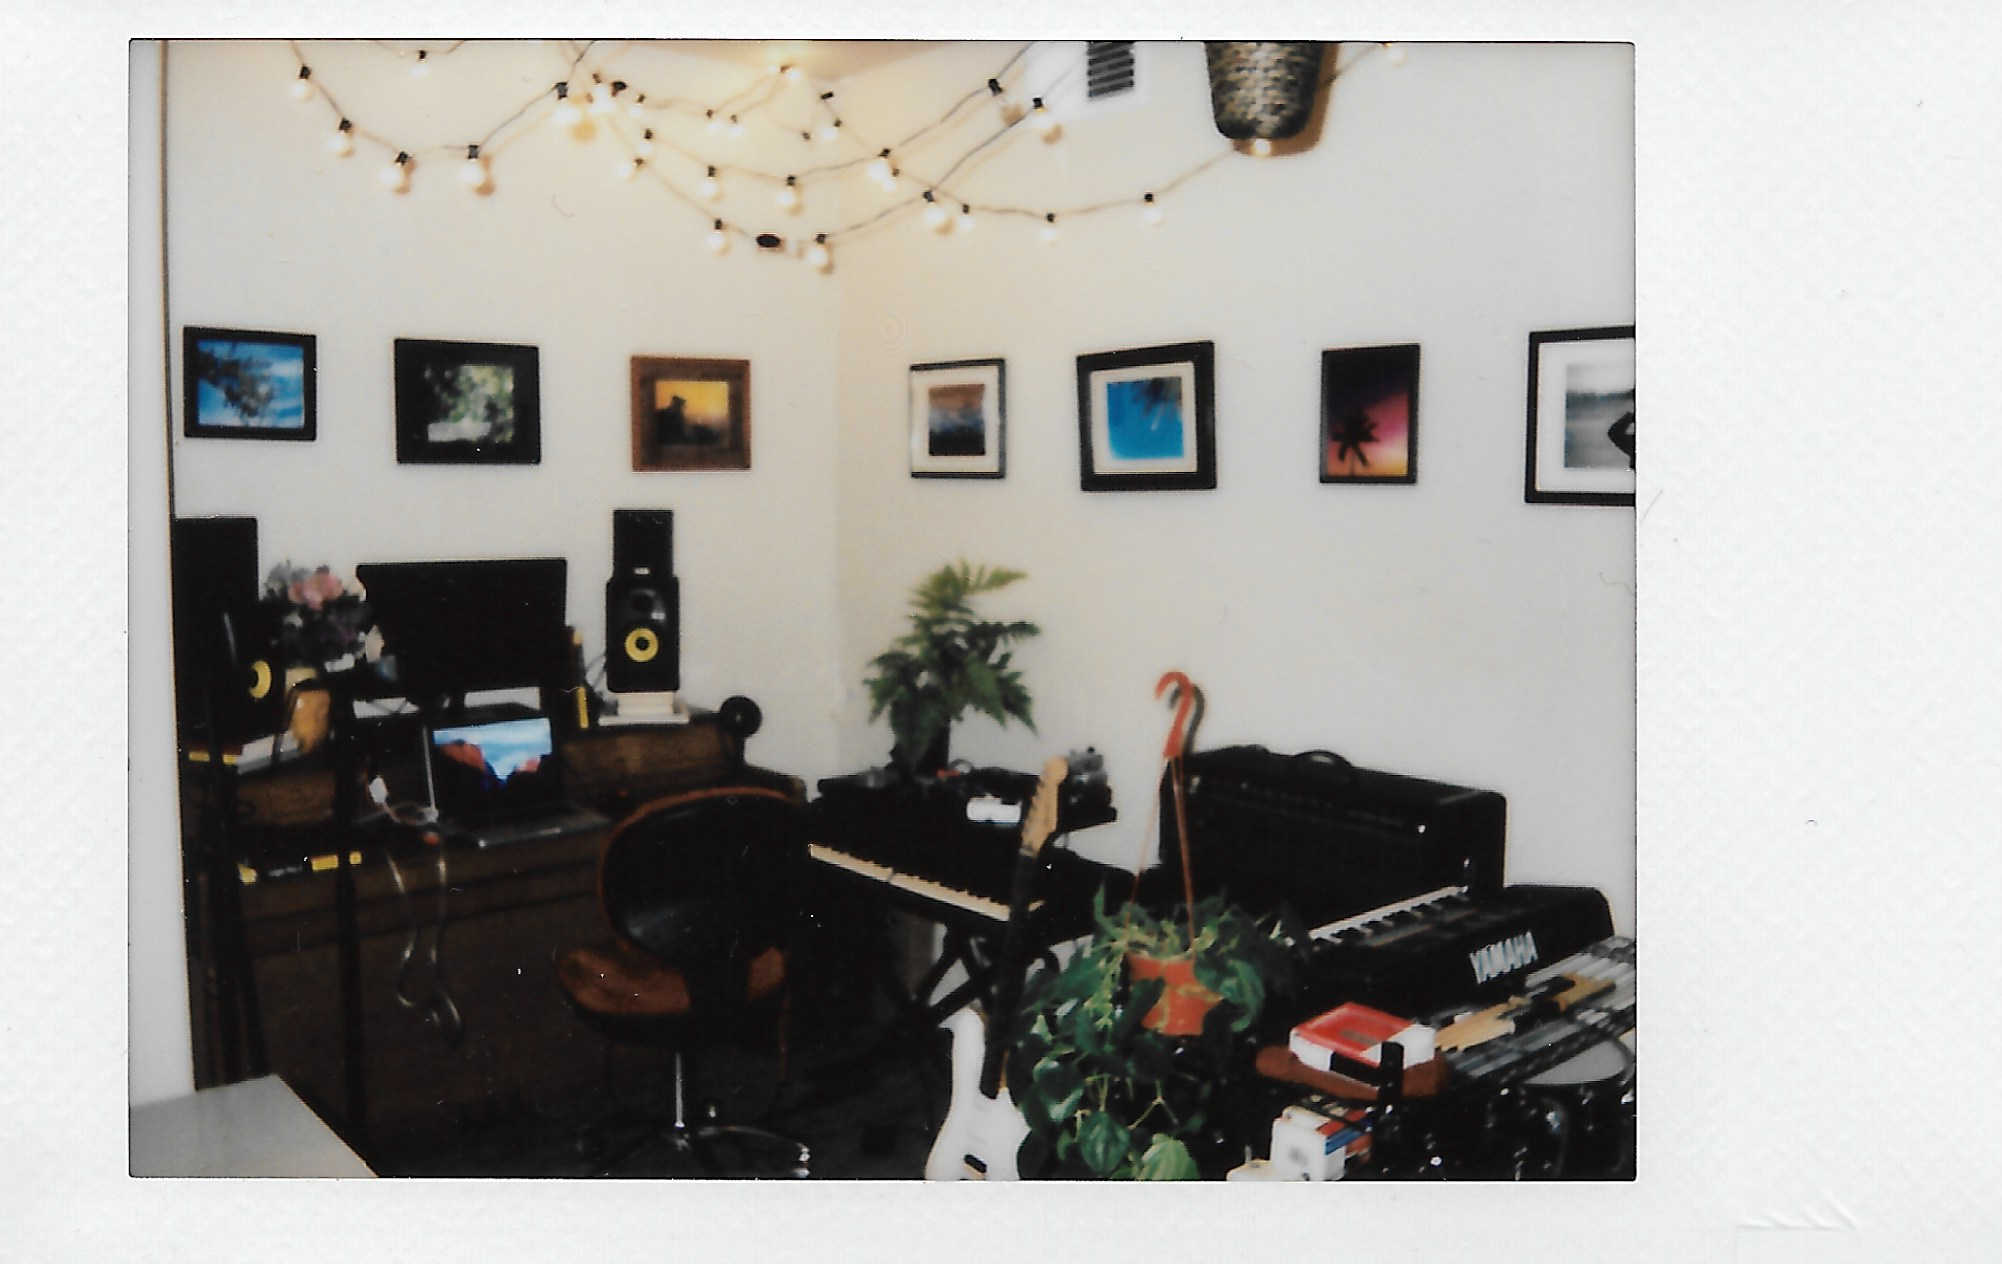 1_23_18 Apartment Studio.jpeg